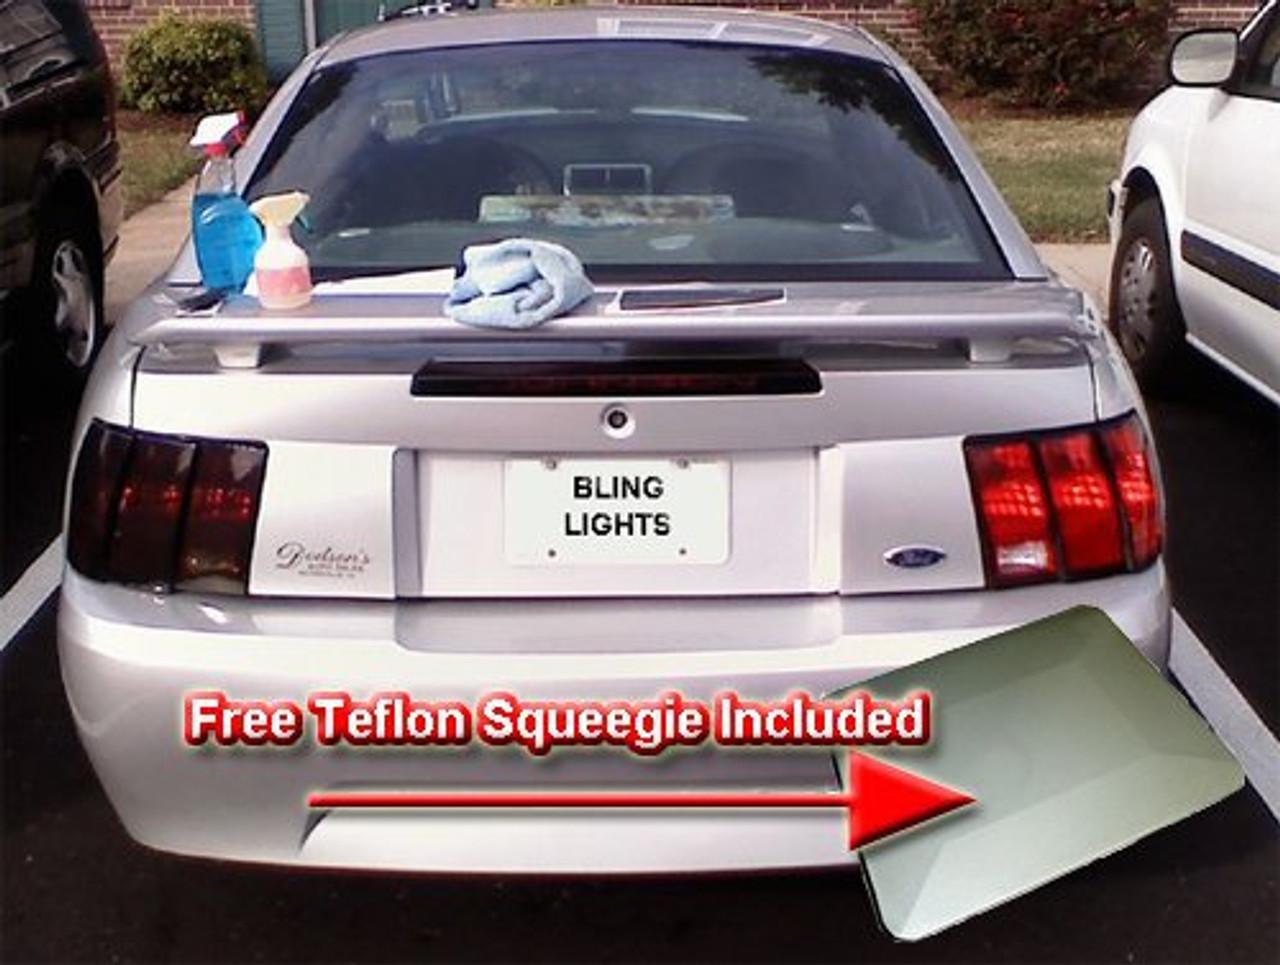 2004-2007 Chevy Malibu Tinted Tail Lights Overlay Lamps Film Kit Smoked  Protection